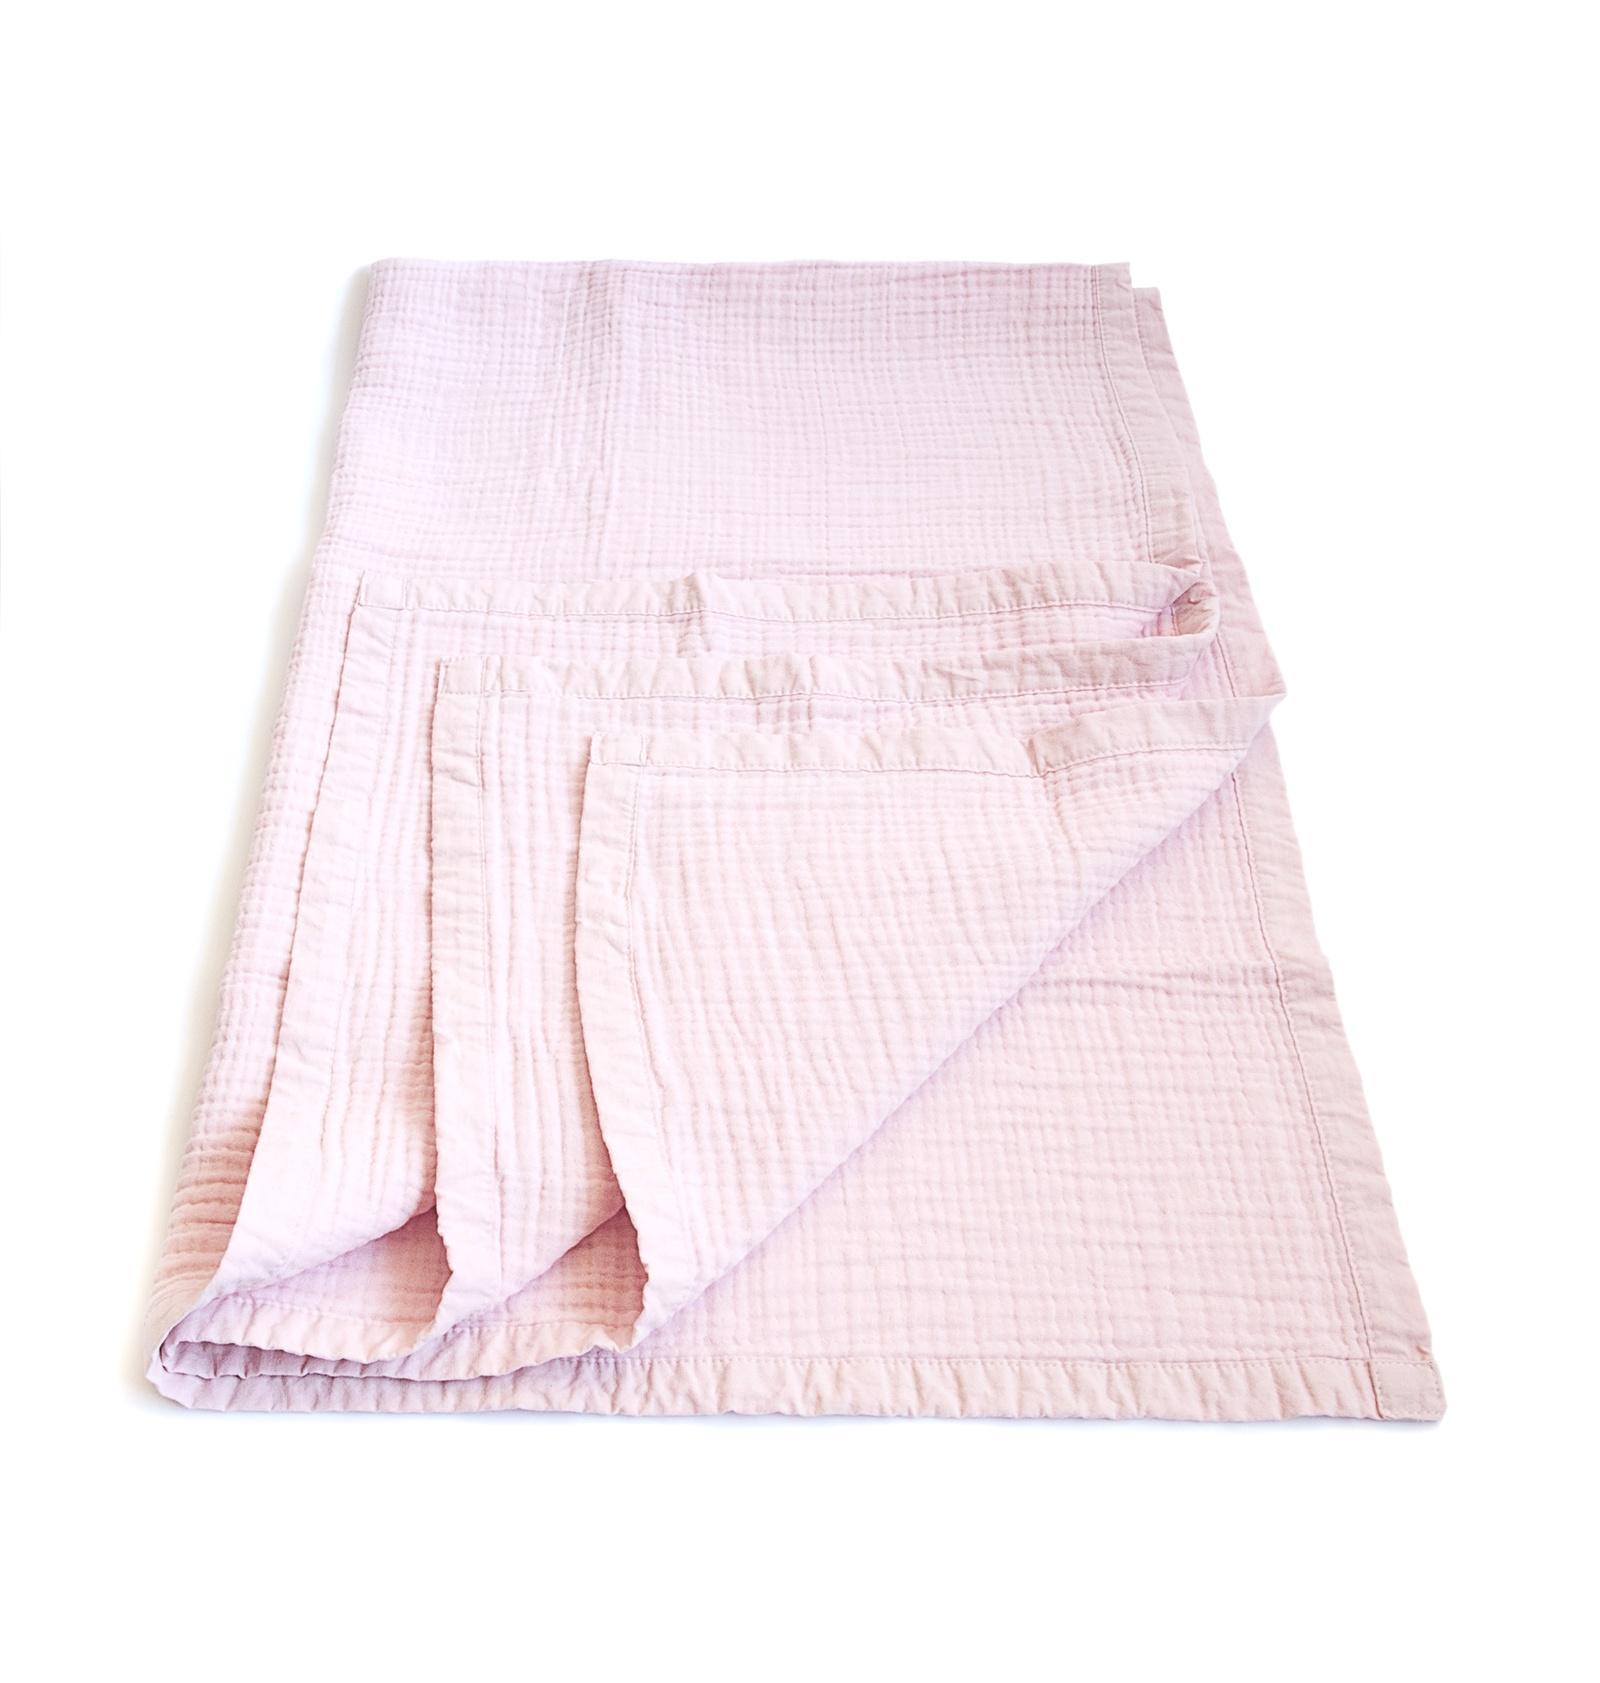 Муслиновое одеяло MamSi 8 слоев 120х90см розовый